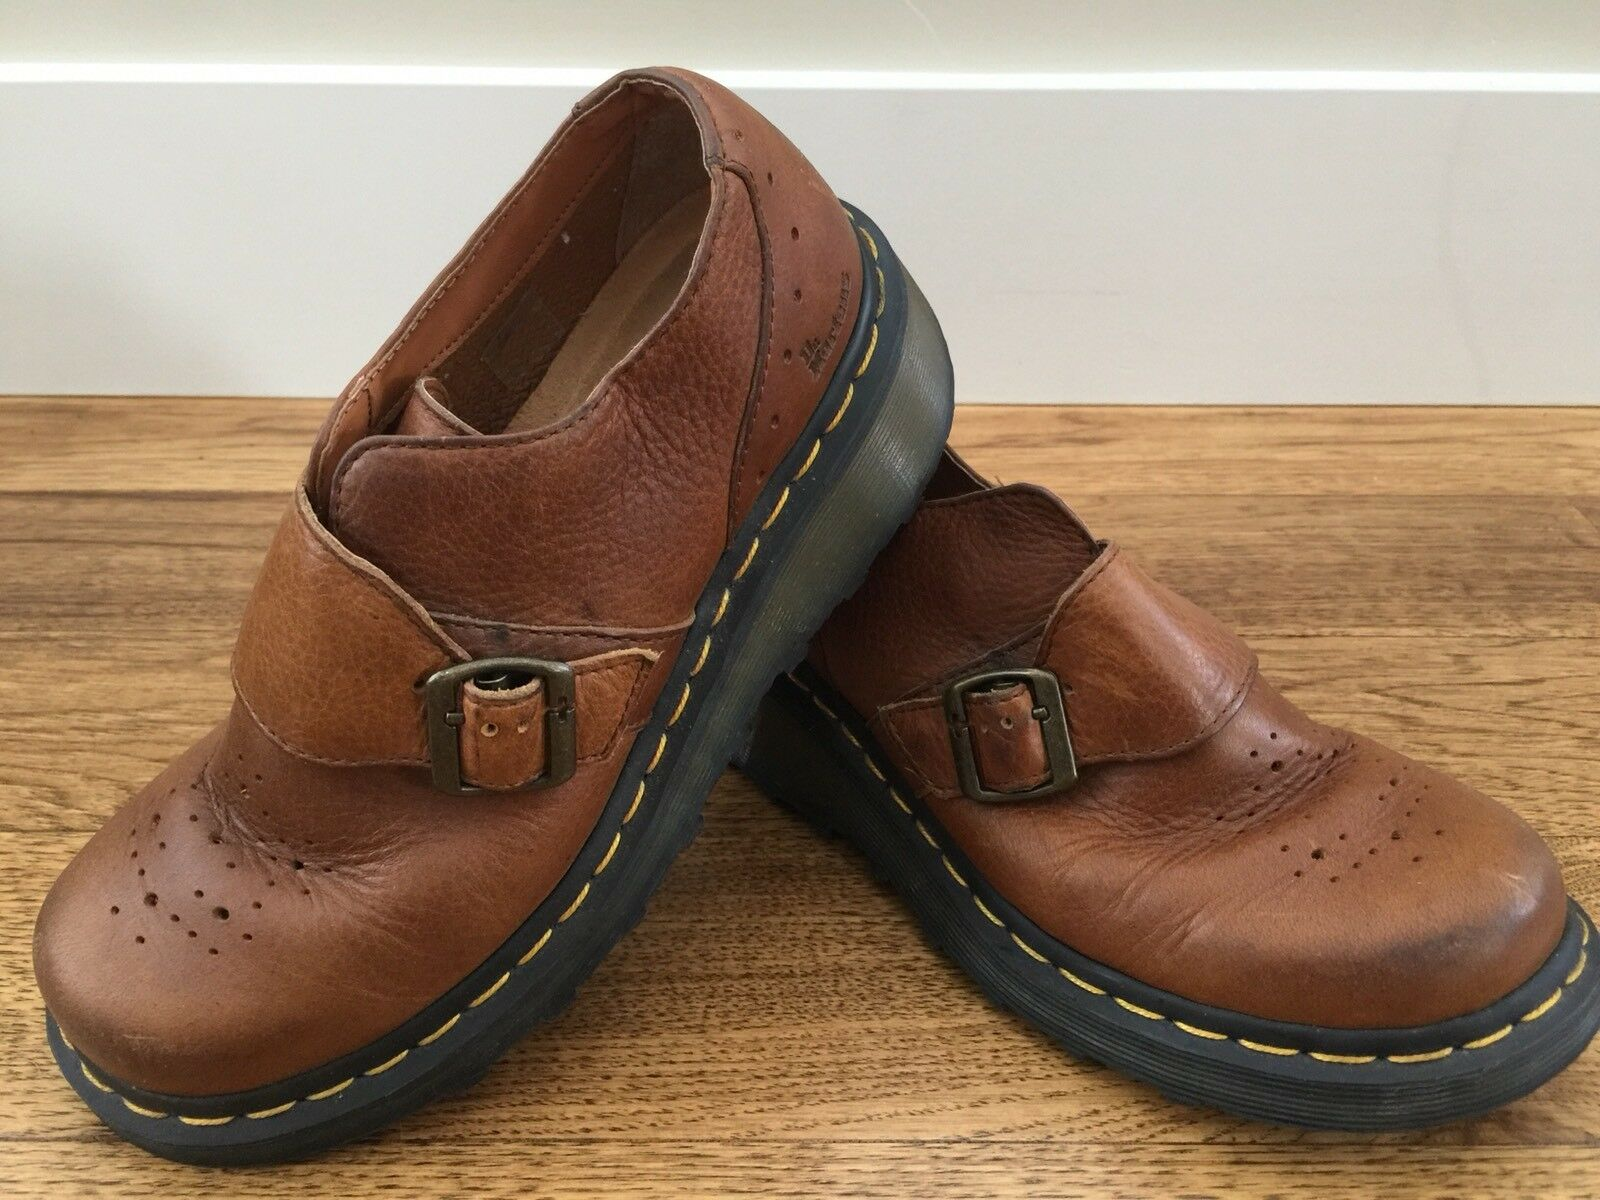 Doc Dr Martens marrone Pelle Buckle Loafers UK size 6 ** US size 7M